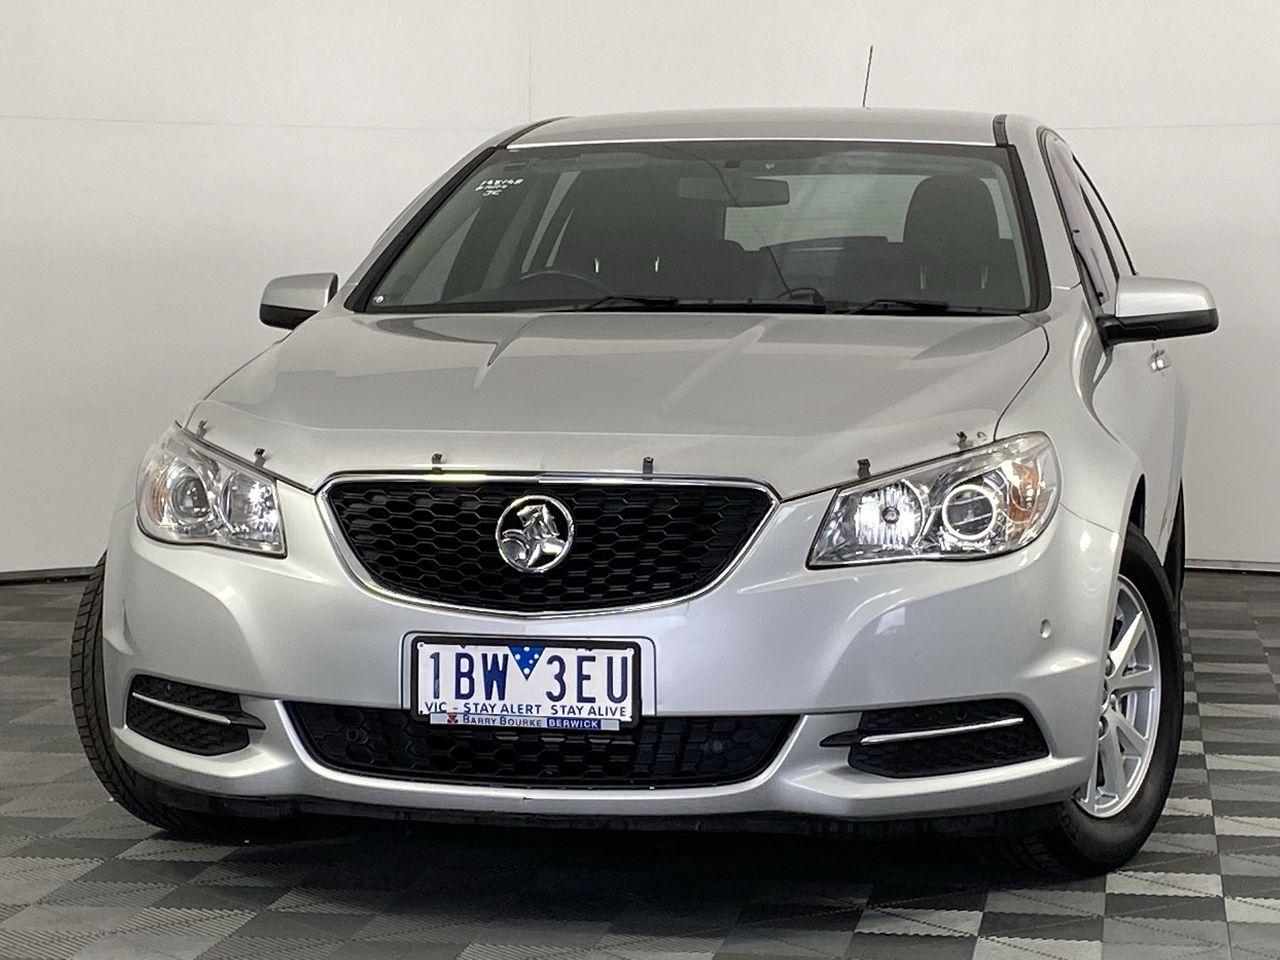 2014 Holden Sportwagon Evoke VF Automatic Wagon